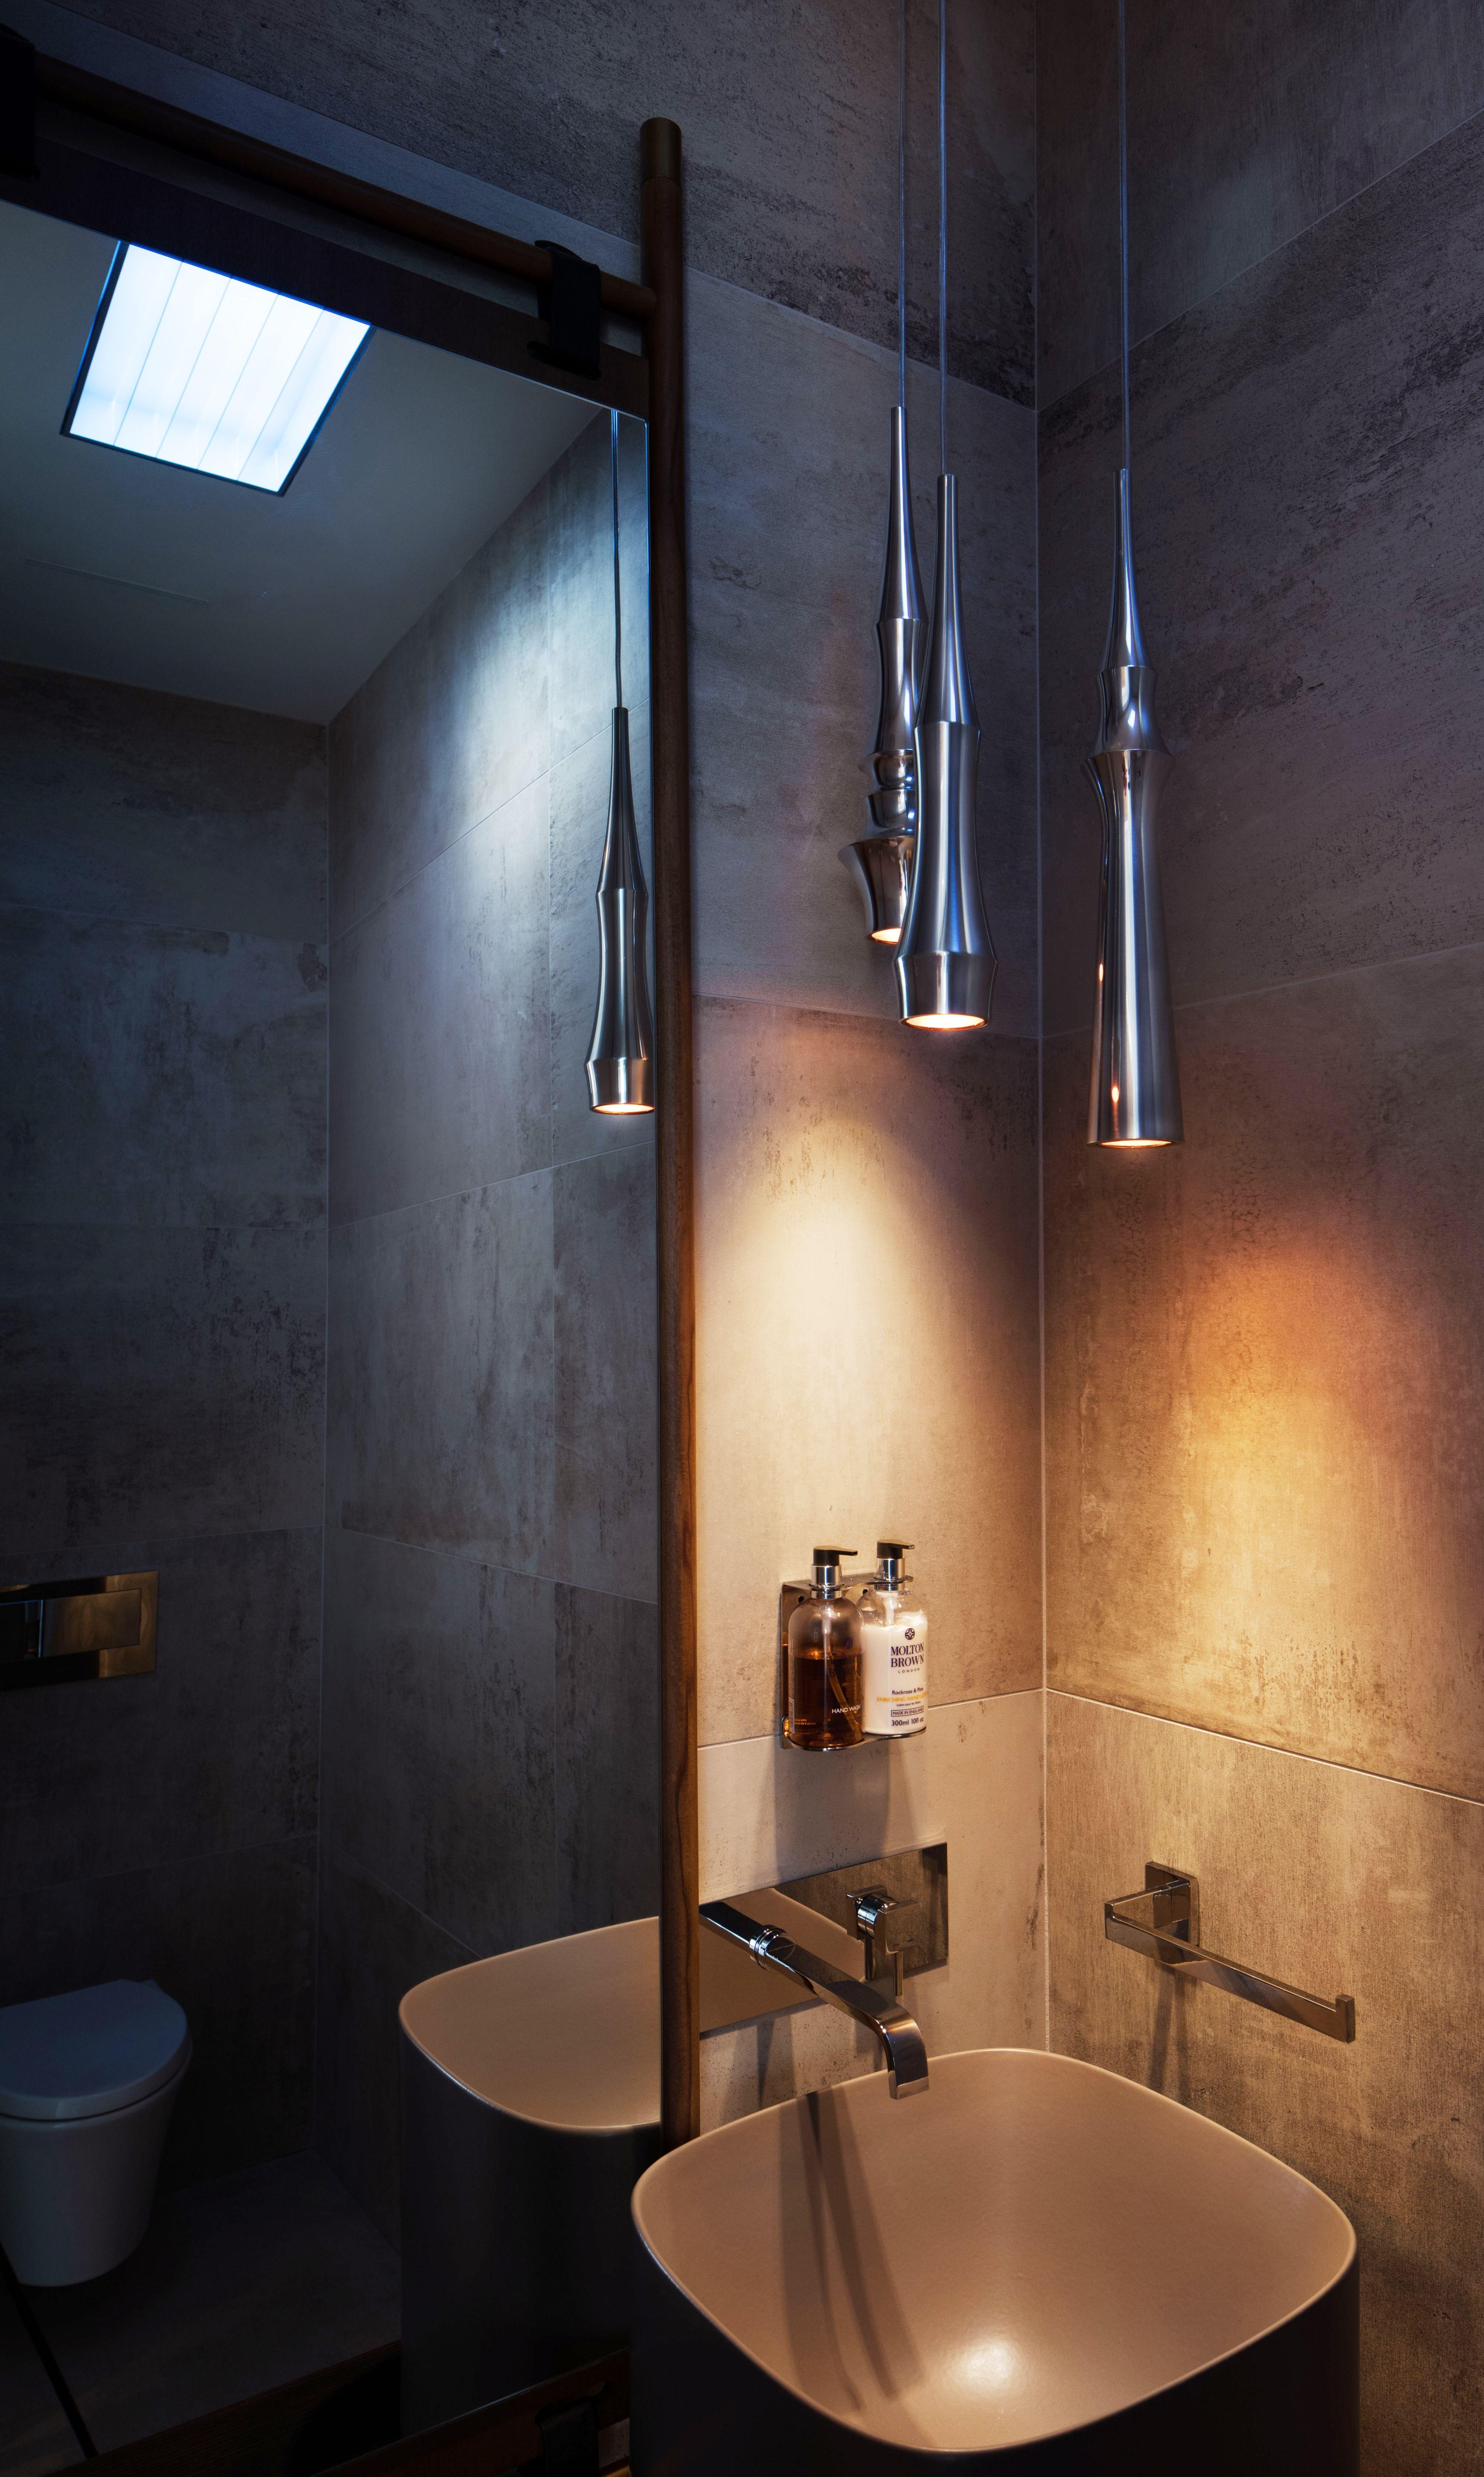 Project 01 Name Bathroom Lighting Design Bathroom Light Fixtures Contemporary Bathroom Lighting